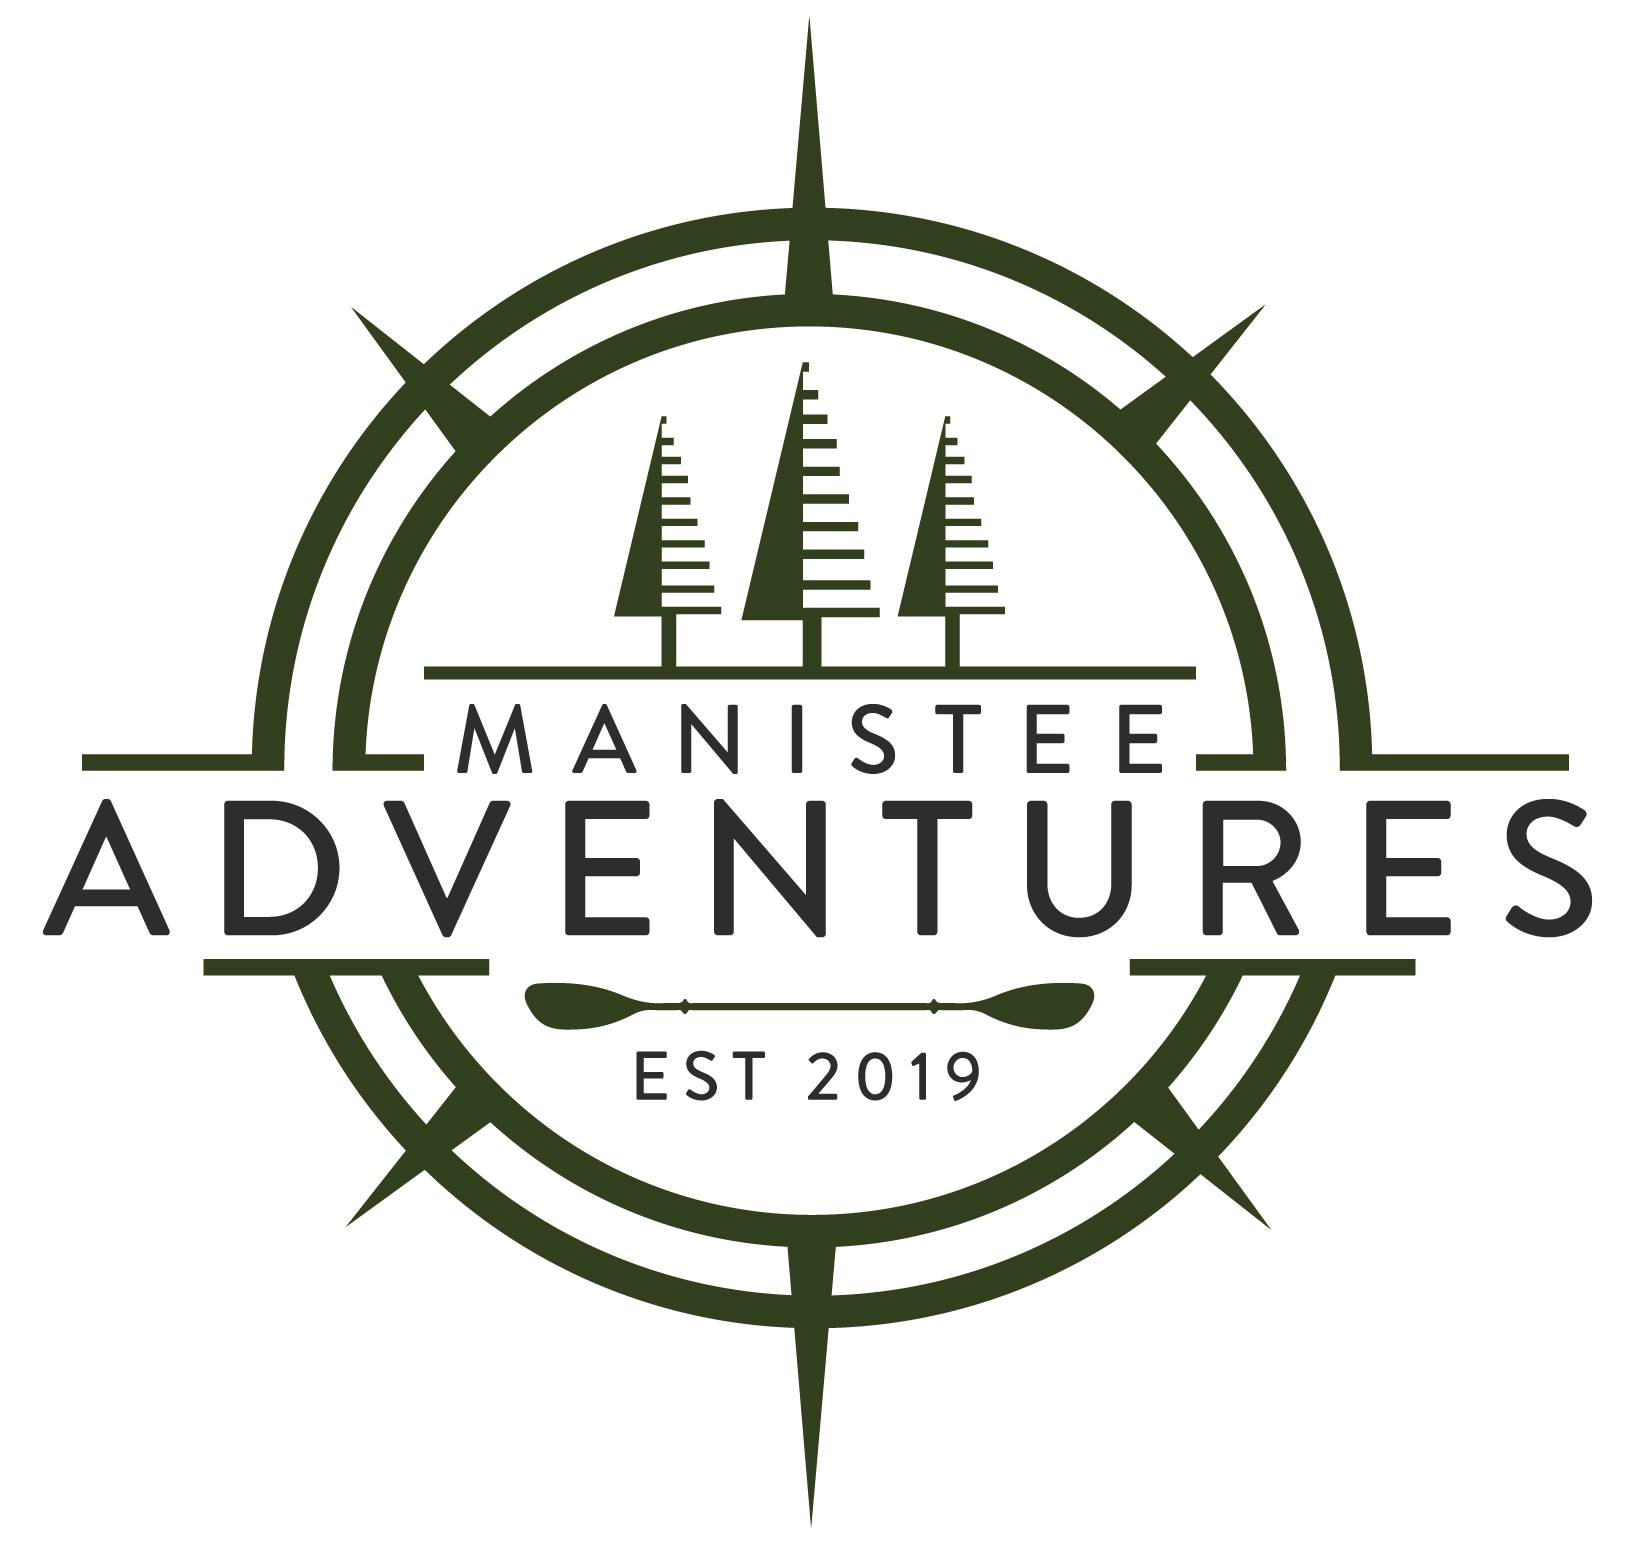 Manistee Adventures